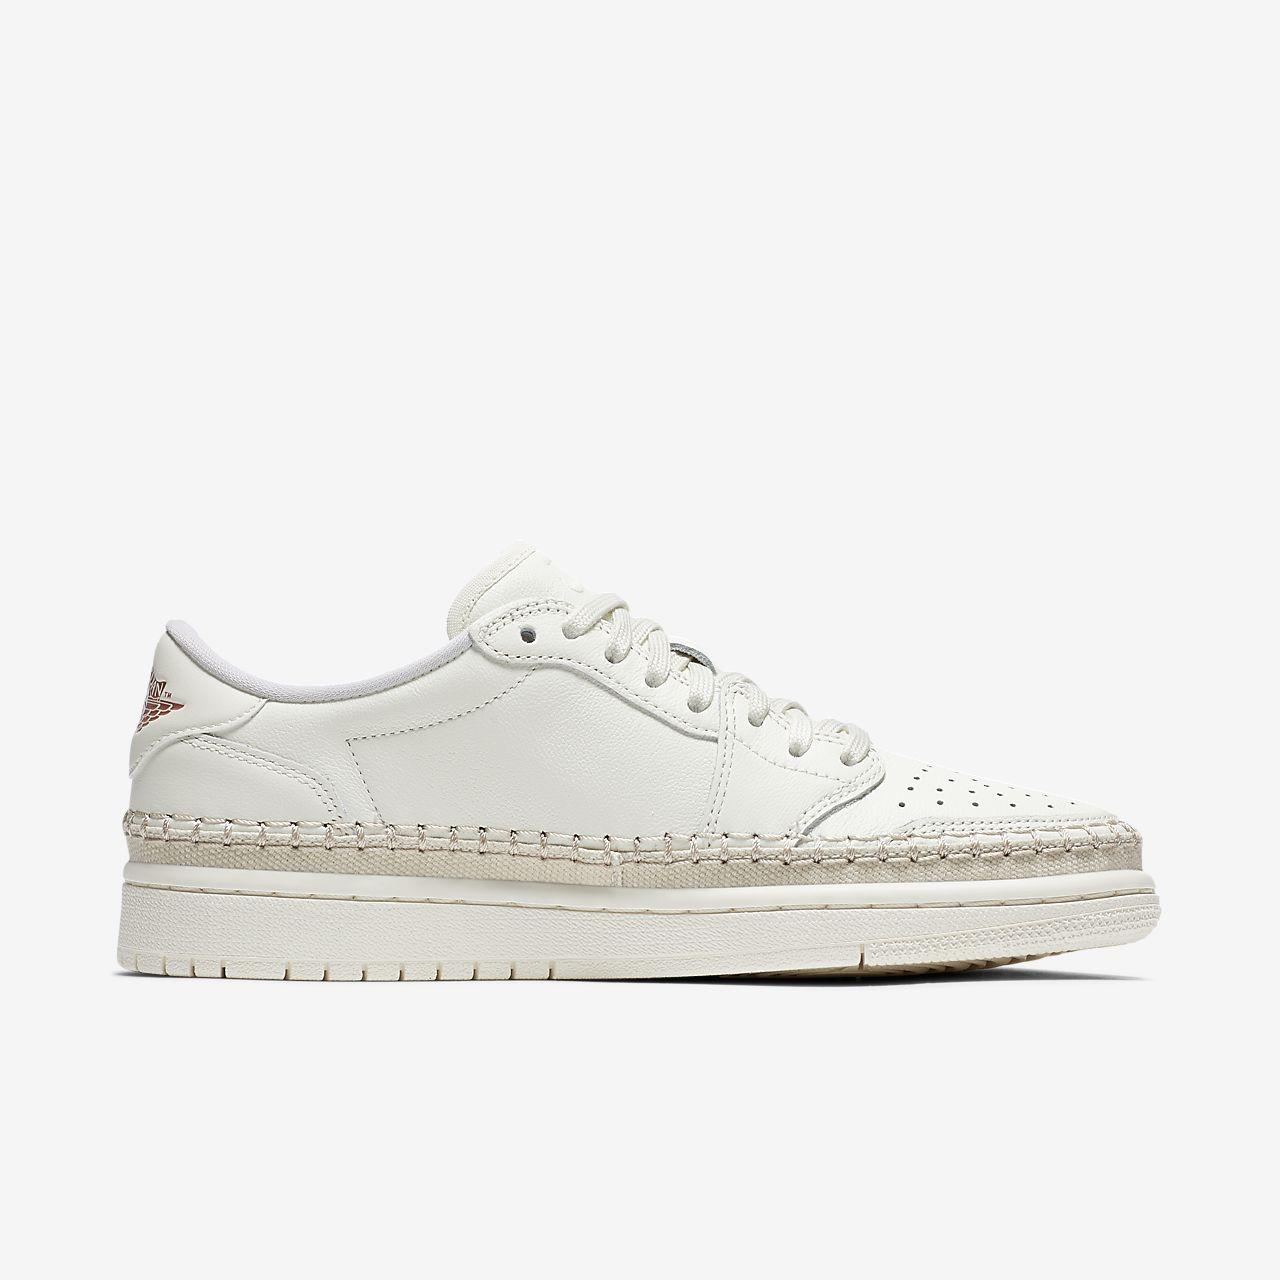 ... Air Jordan 1 Retro Low NS Women\u0027s Shoe